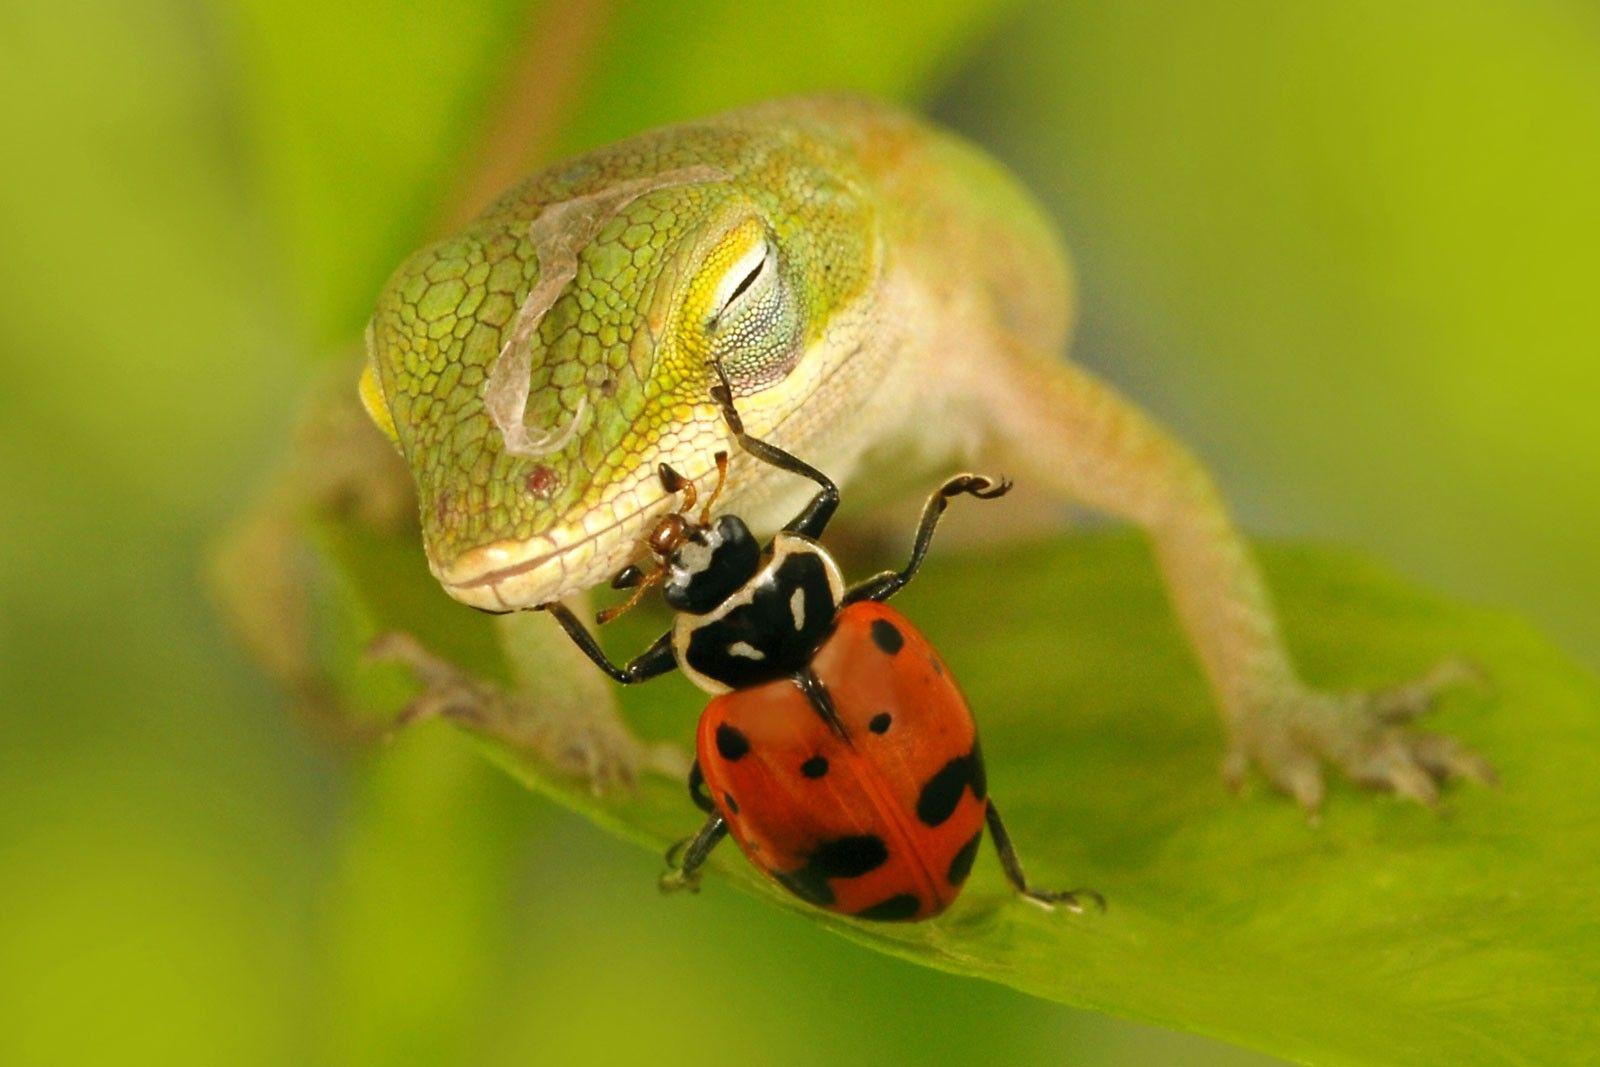 Anole Baby Lizard and Ladybug | Ladybugs | Pinterest ...